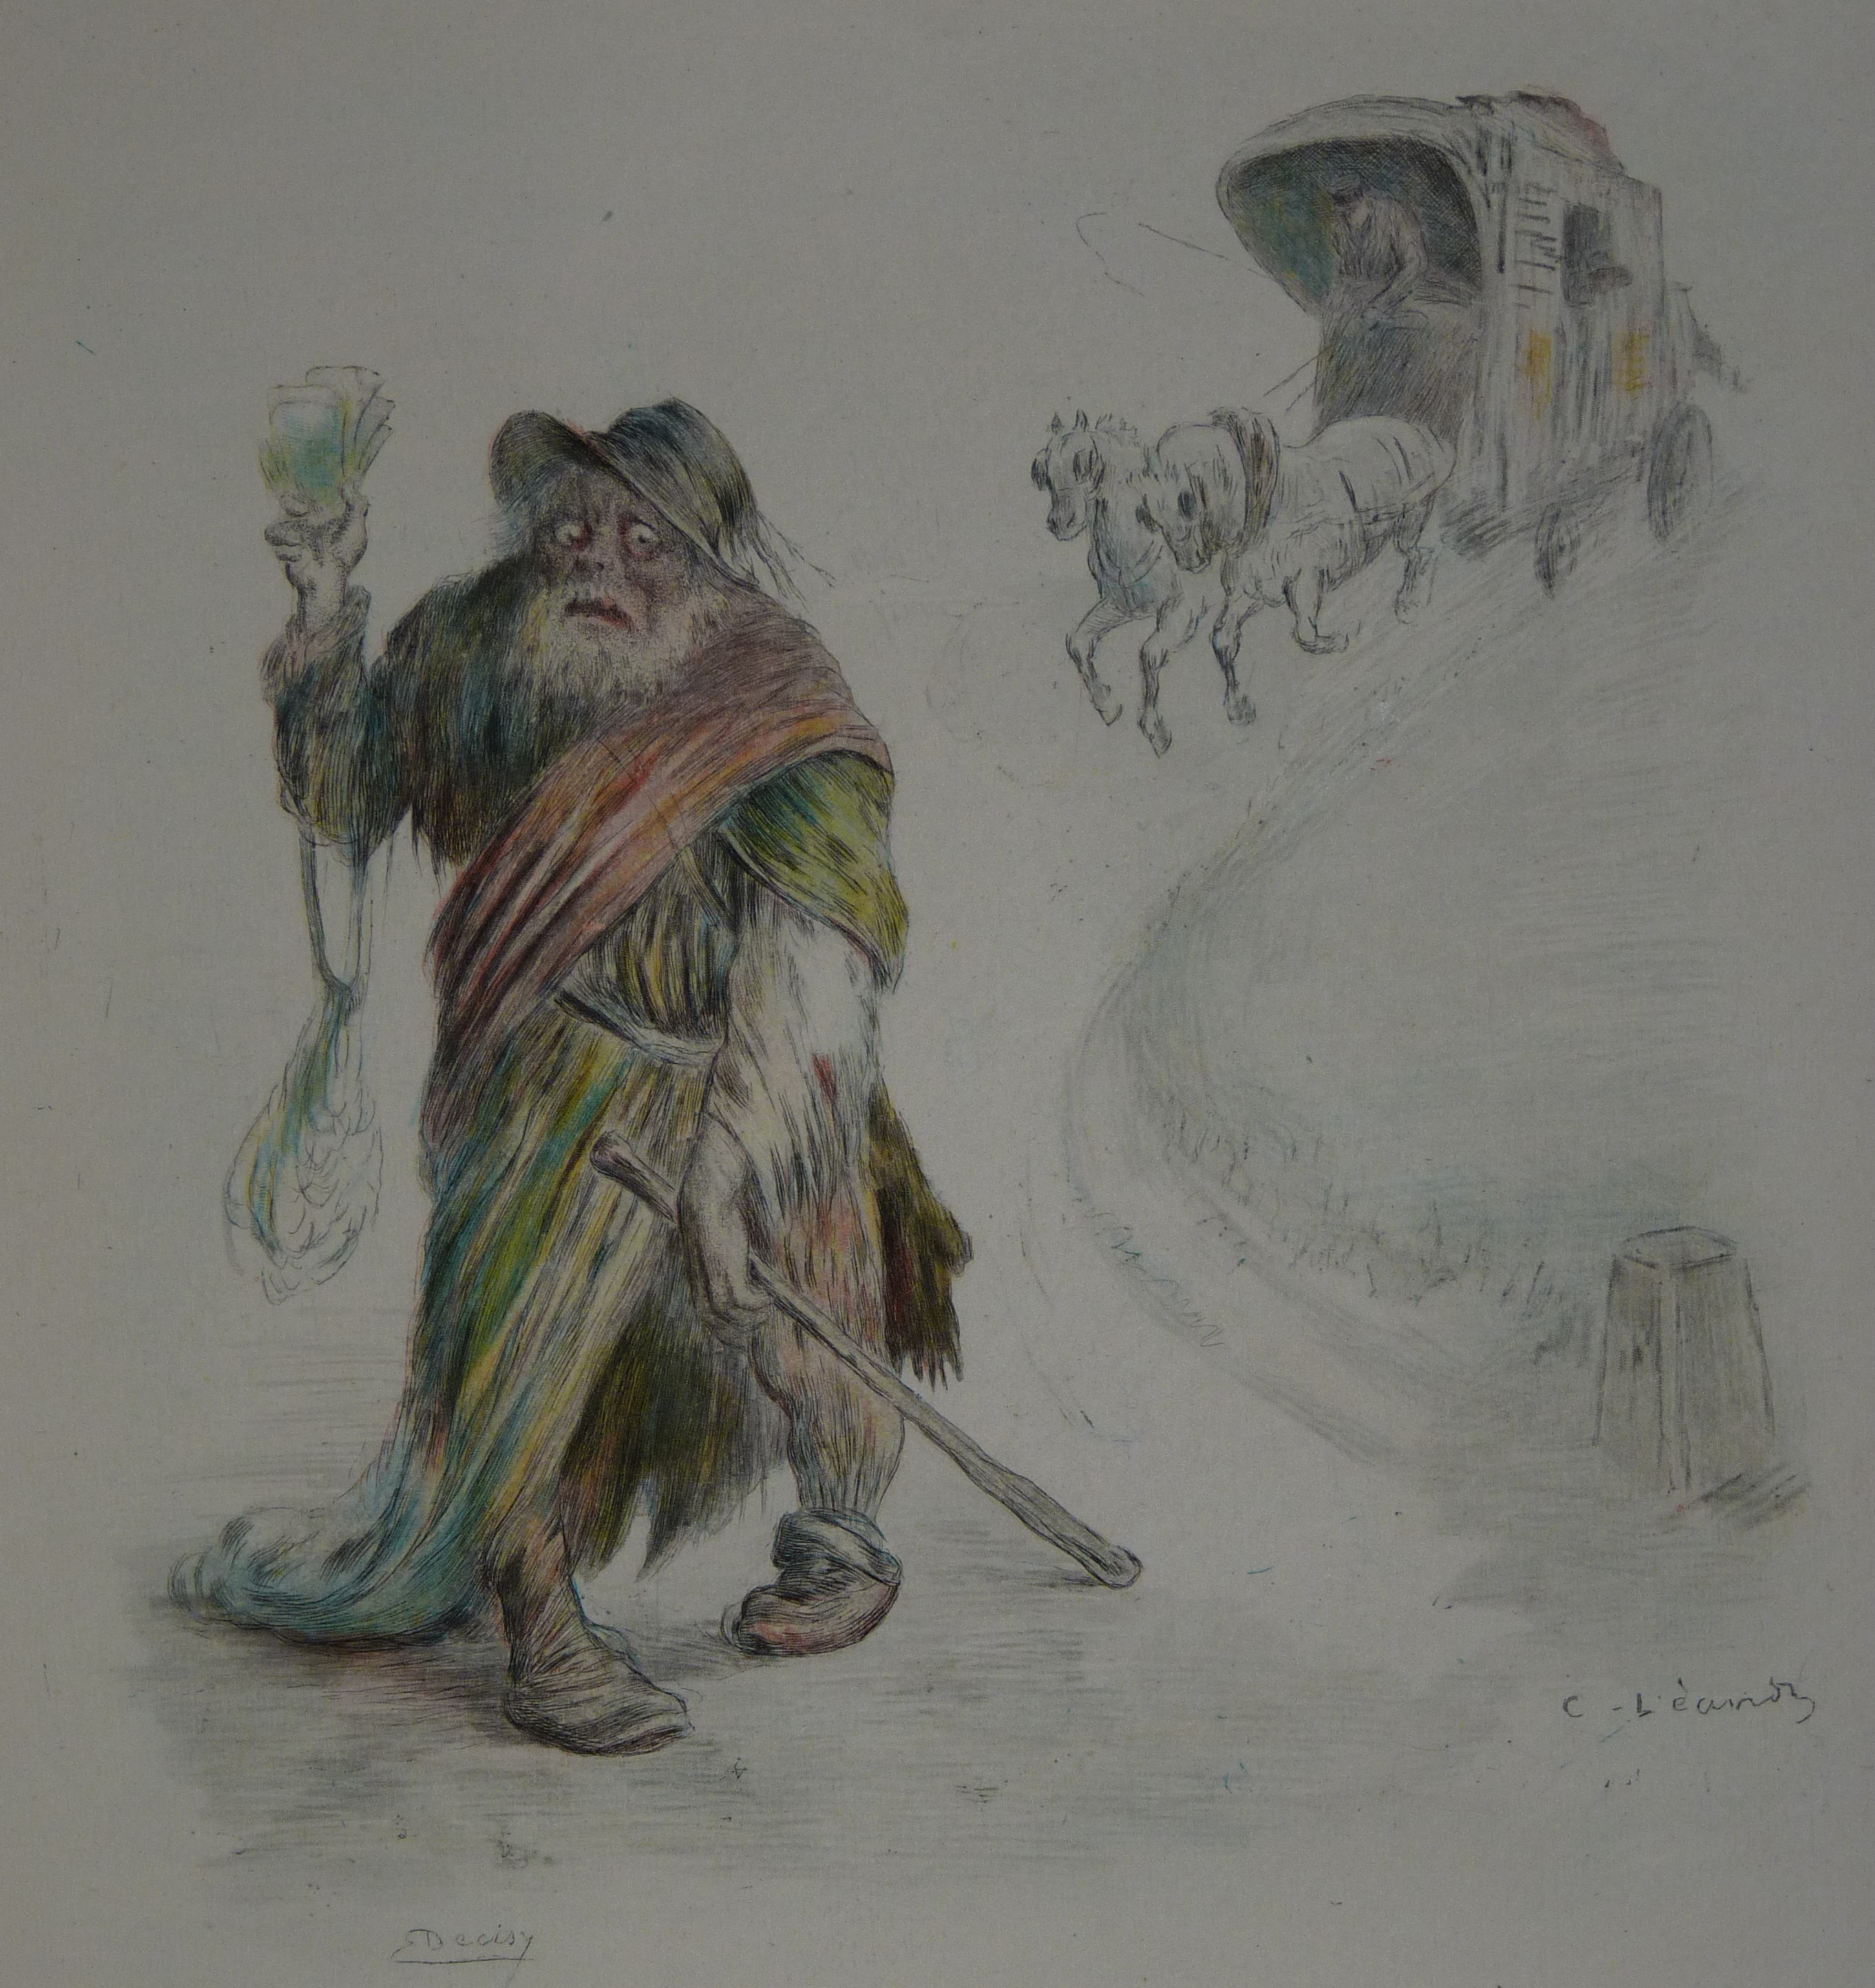 symbolic bovine writework franatildesectais illustration de charles latildecopyandre pour le livre madame bovary de flaubert gravatildecopy atildenbsp